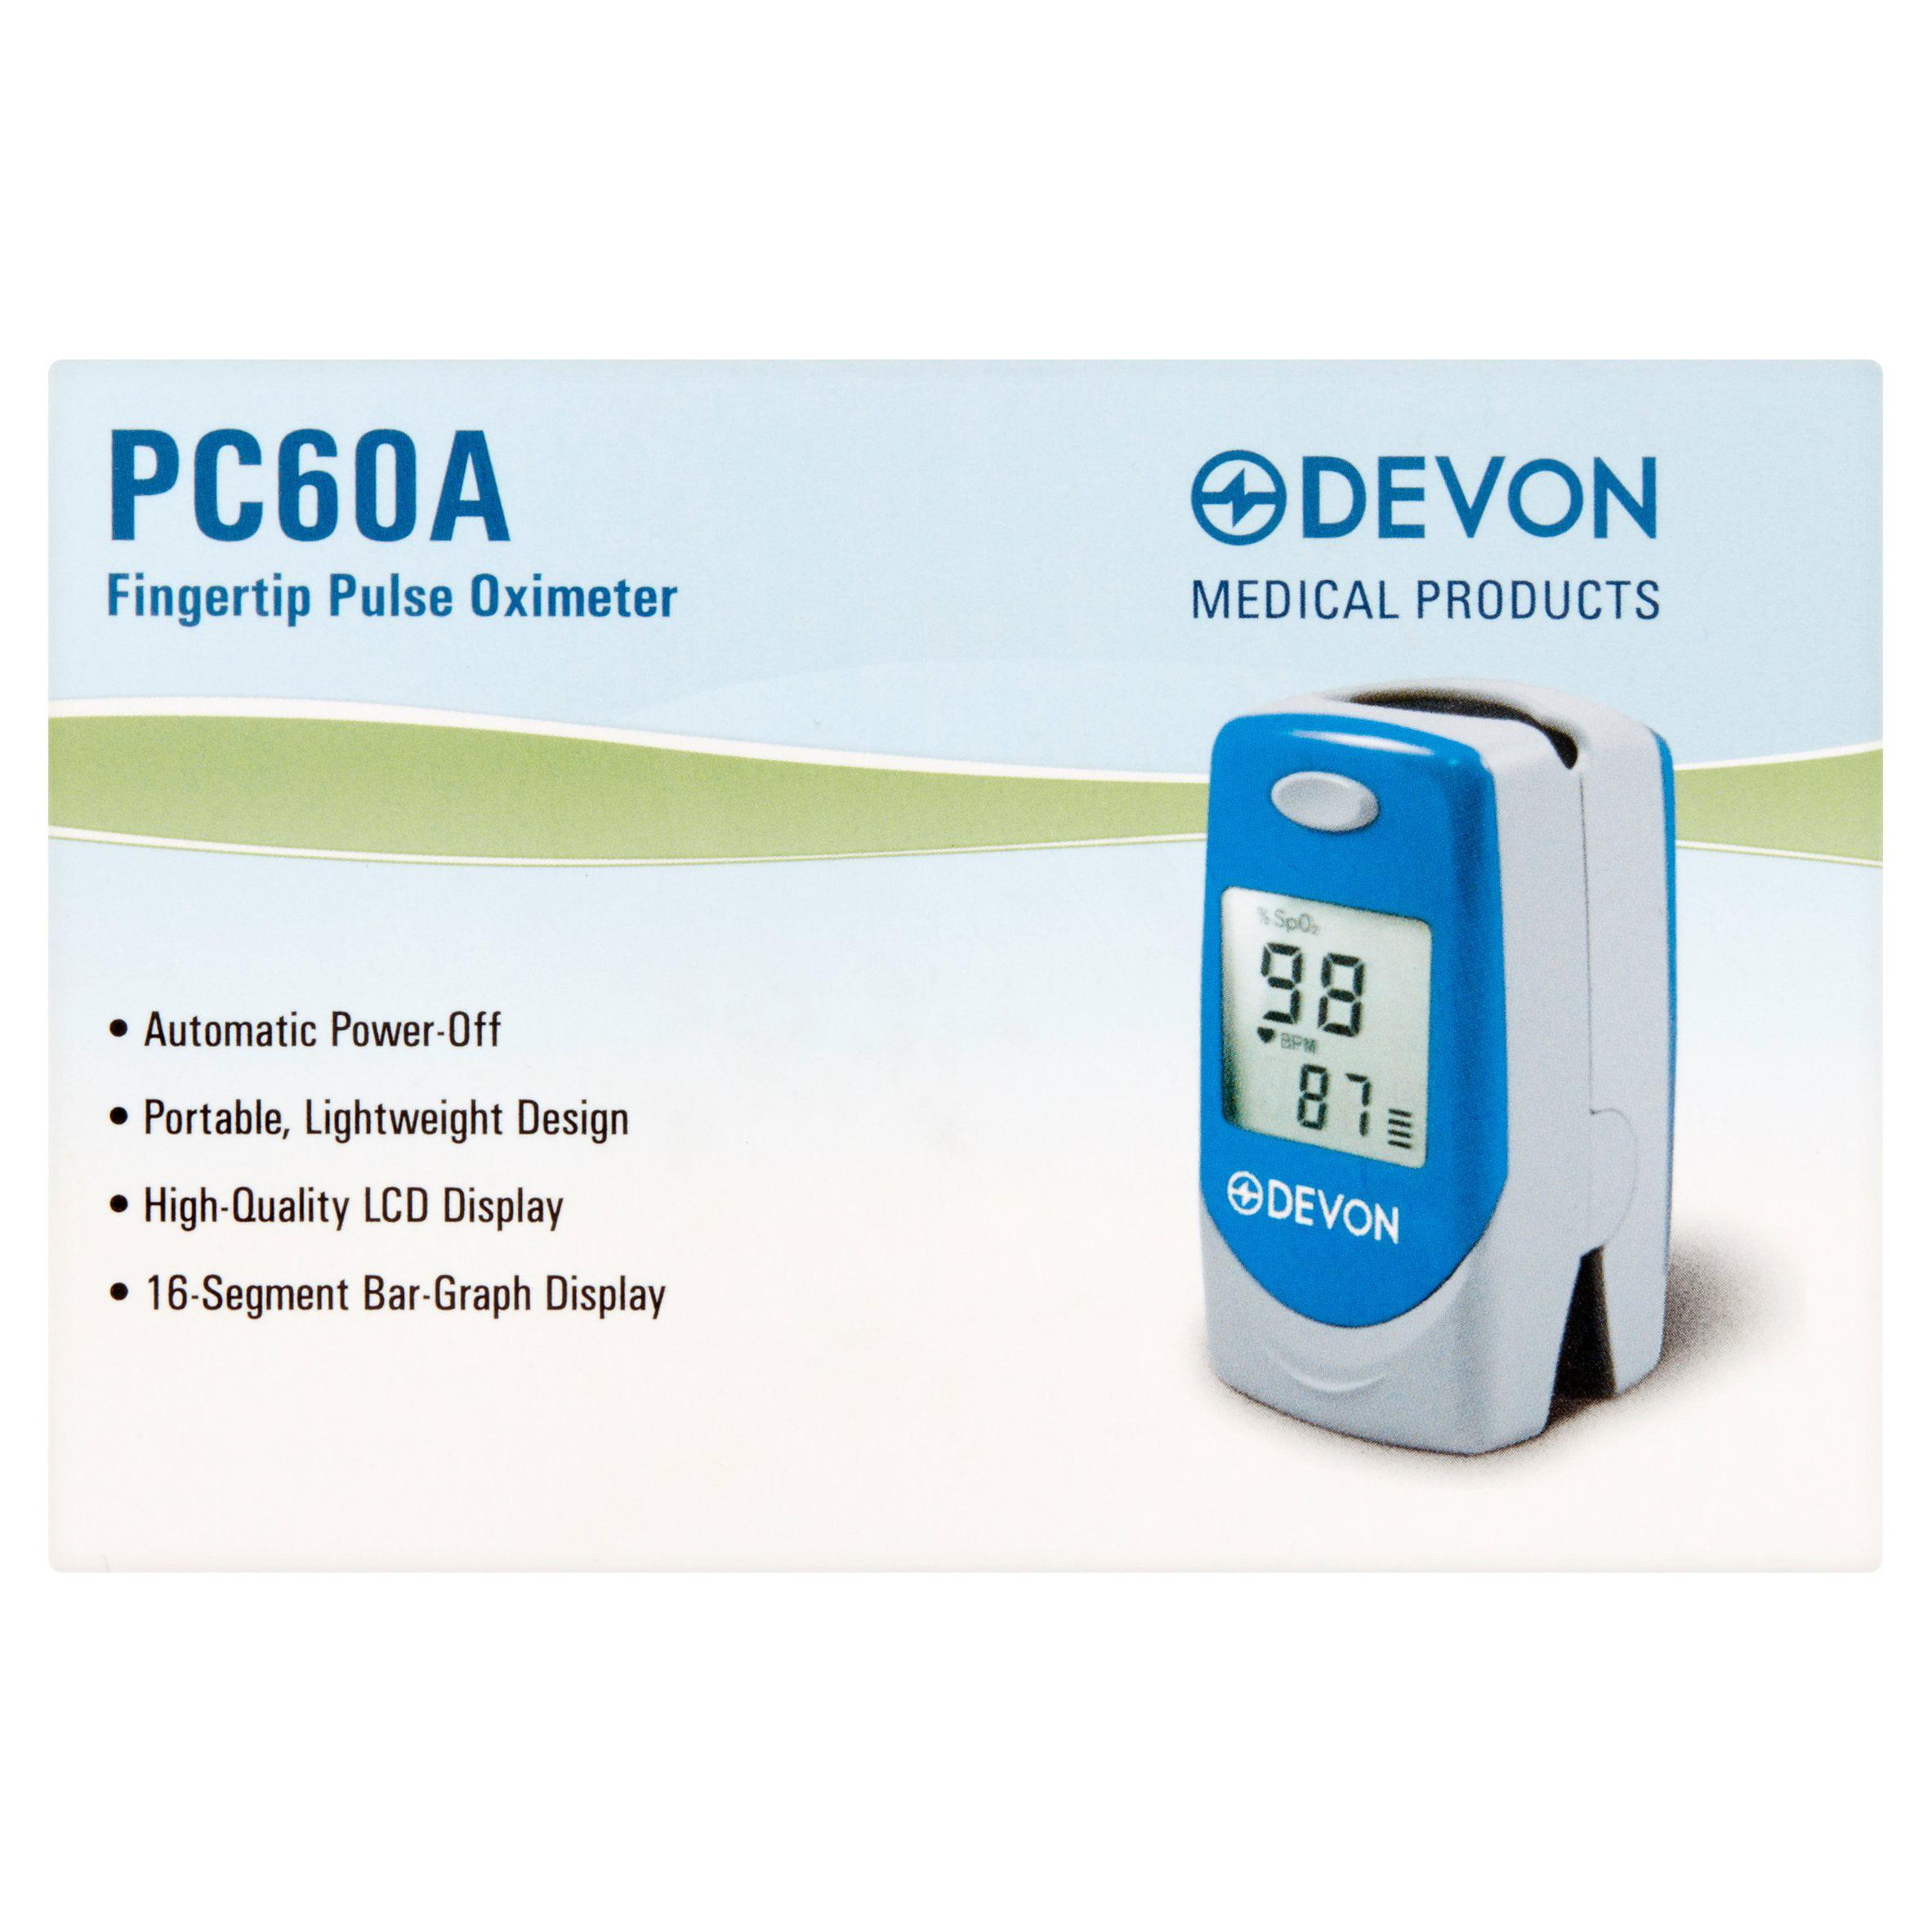 Devon PC60A Fingertip Pulse Oximeter